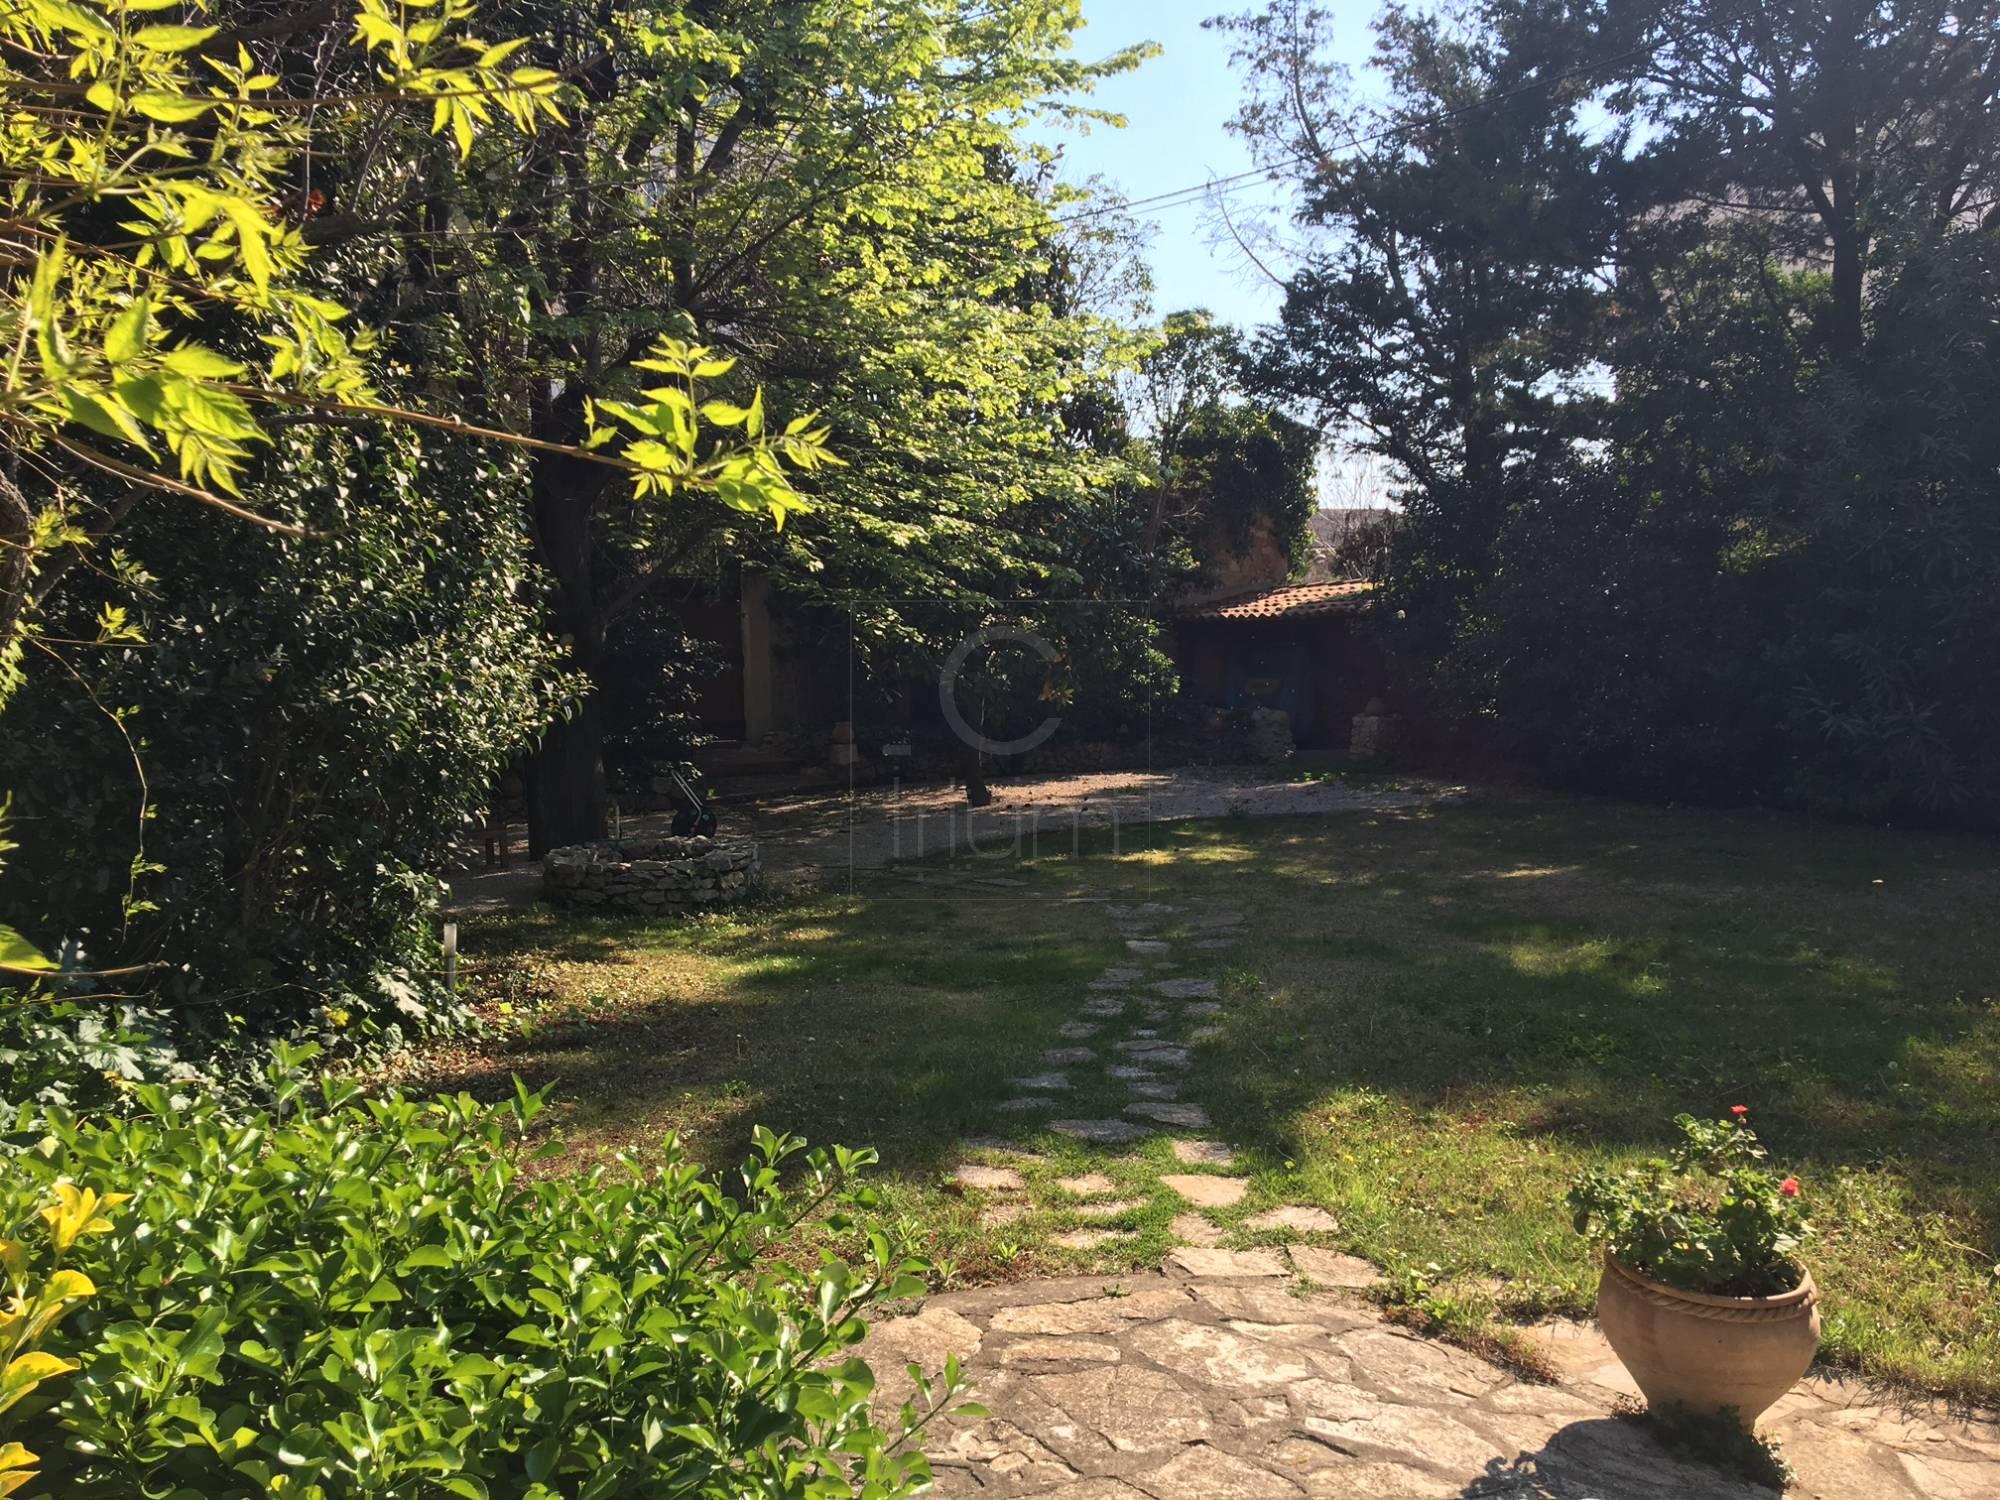 Vente maison marseille 7e jardin terrasse parking t5 f5 - Terrasse vue jardin marseille saint etienne ...